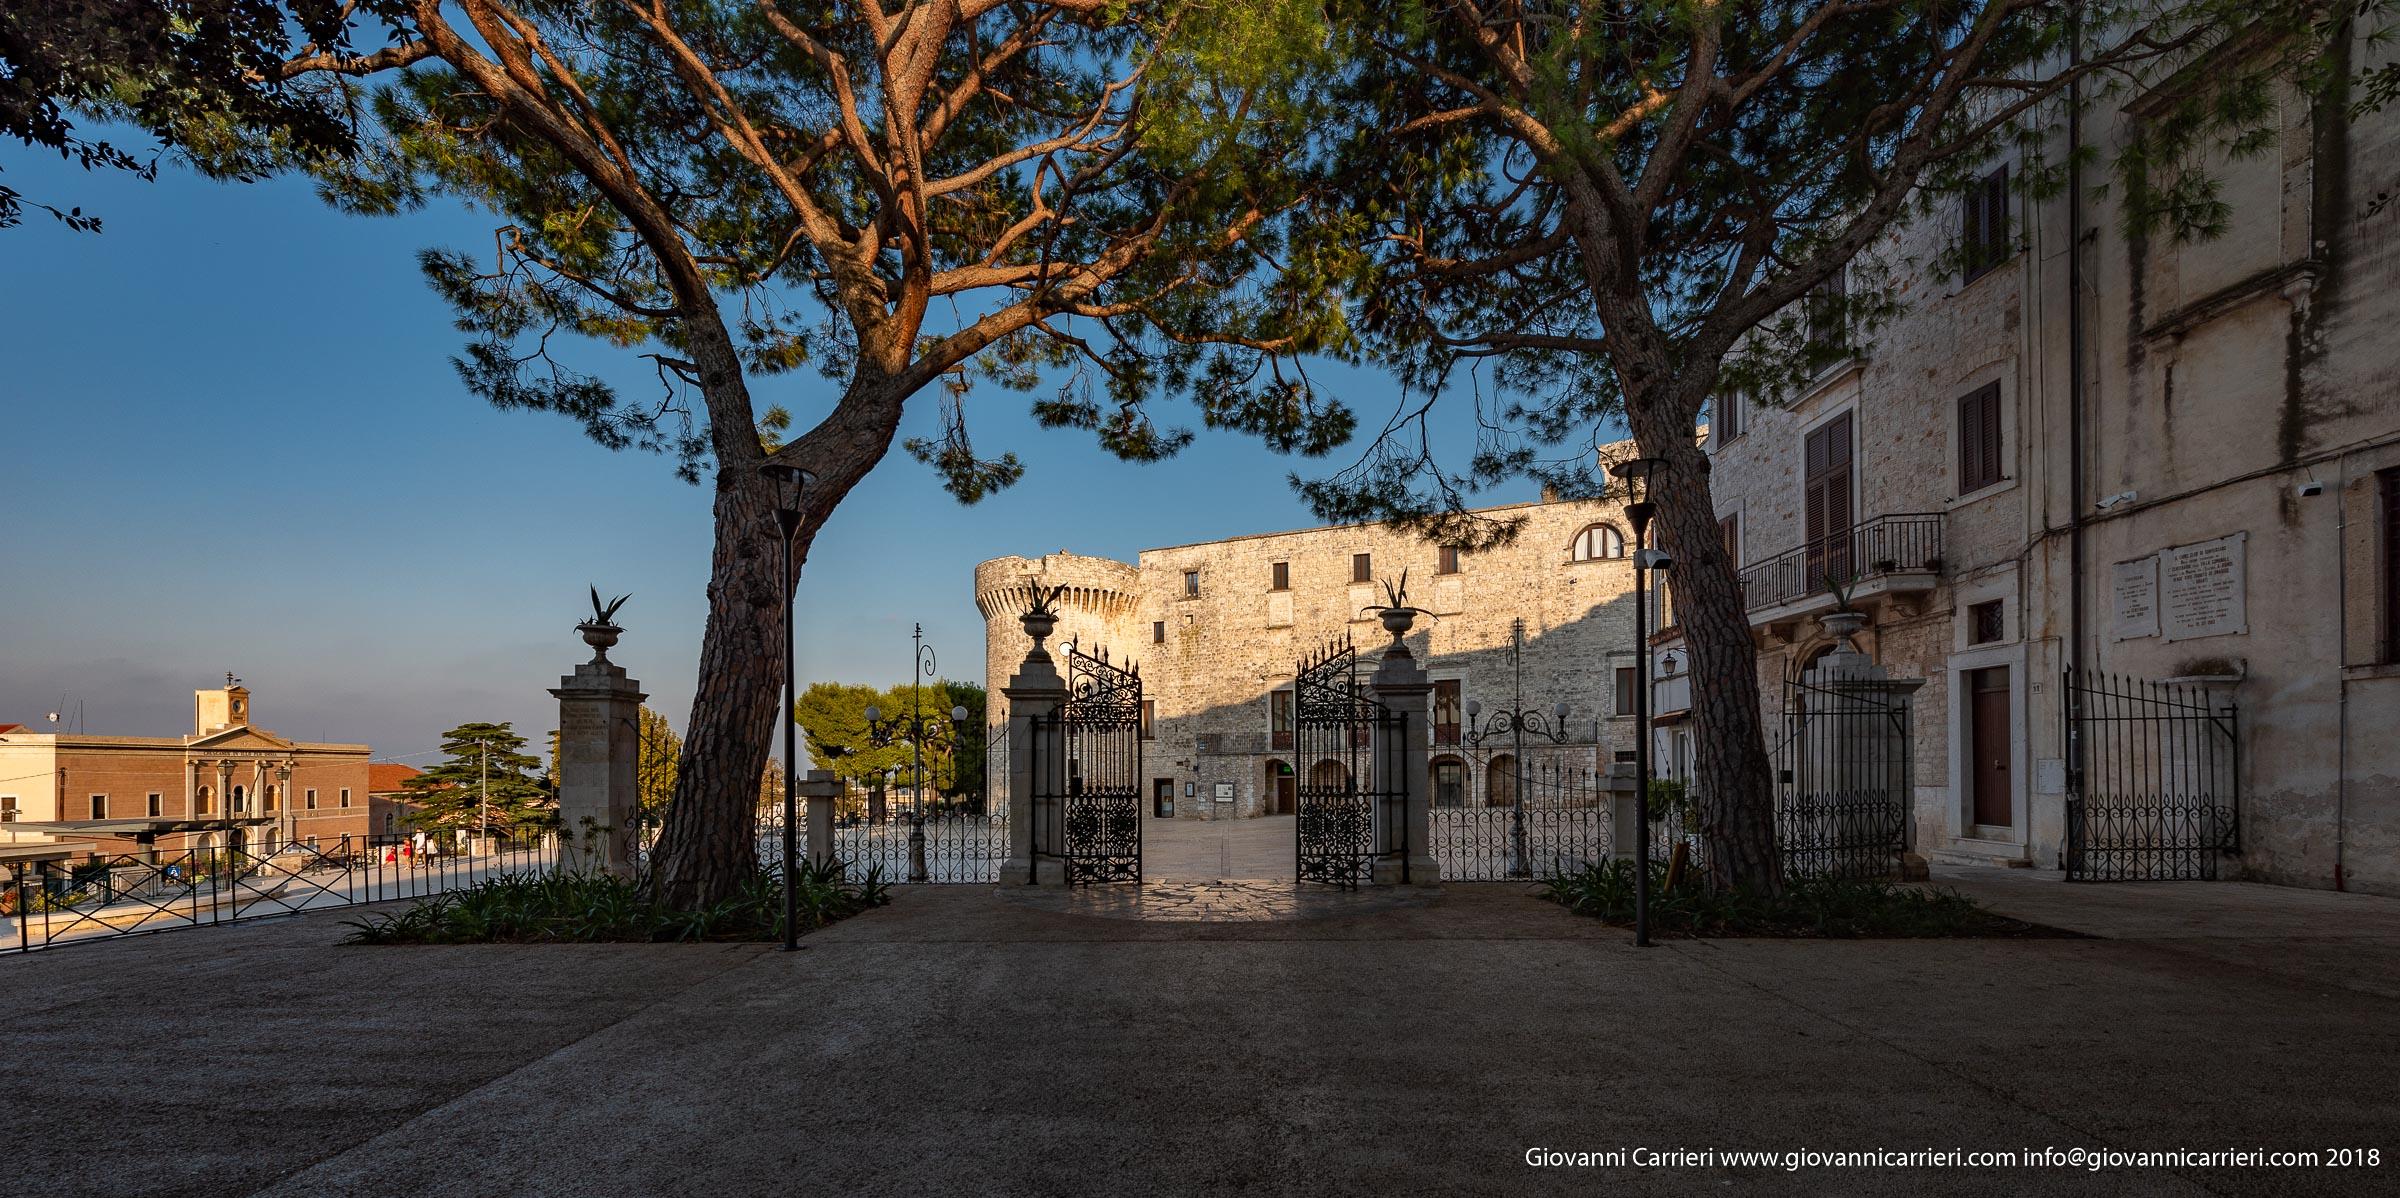 La villa Garibaldi in Conversano